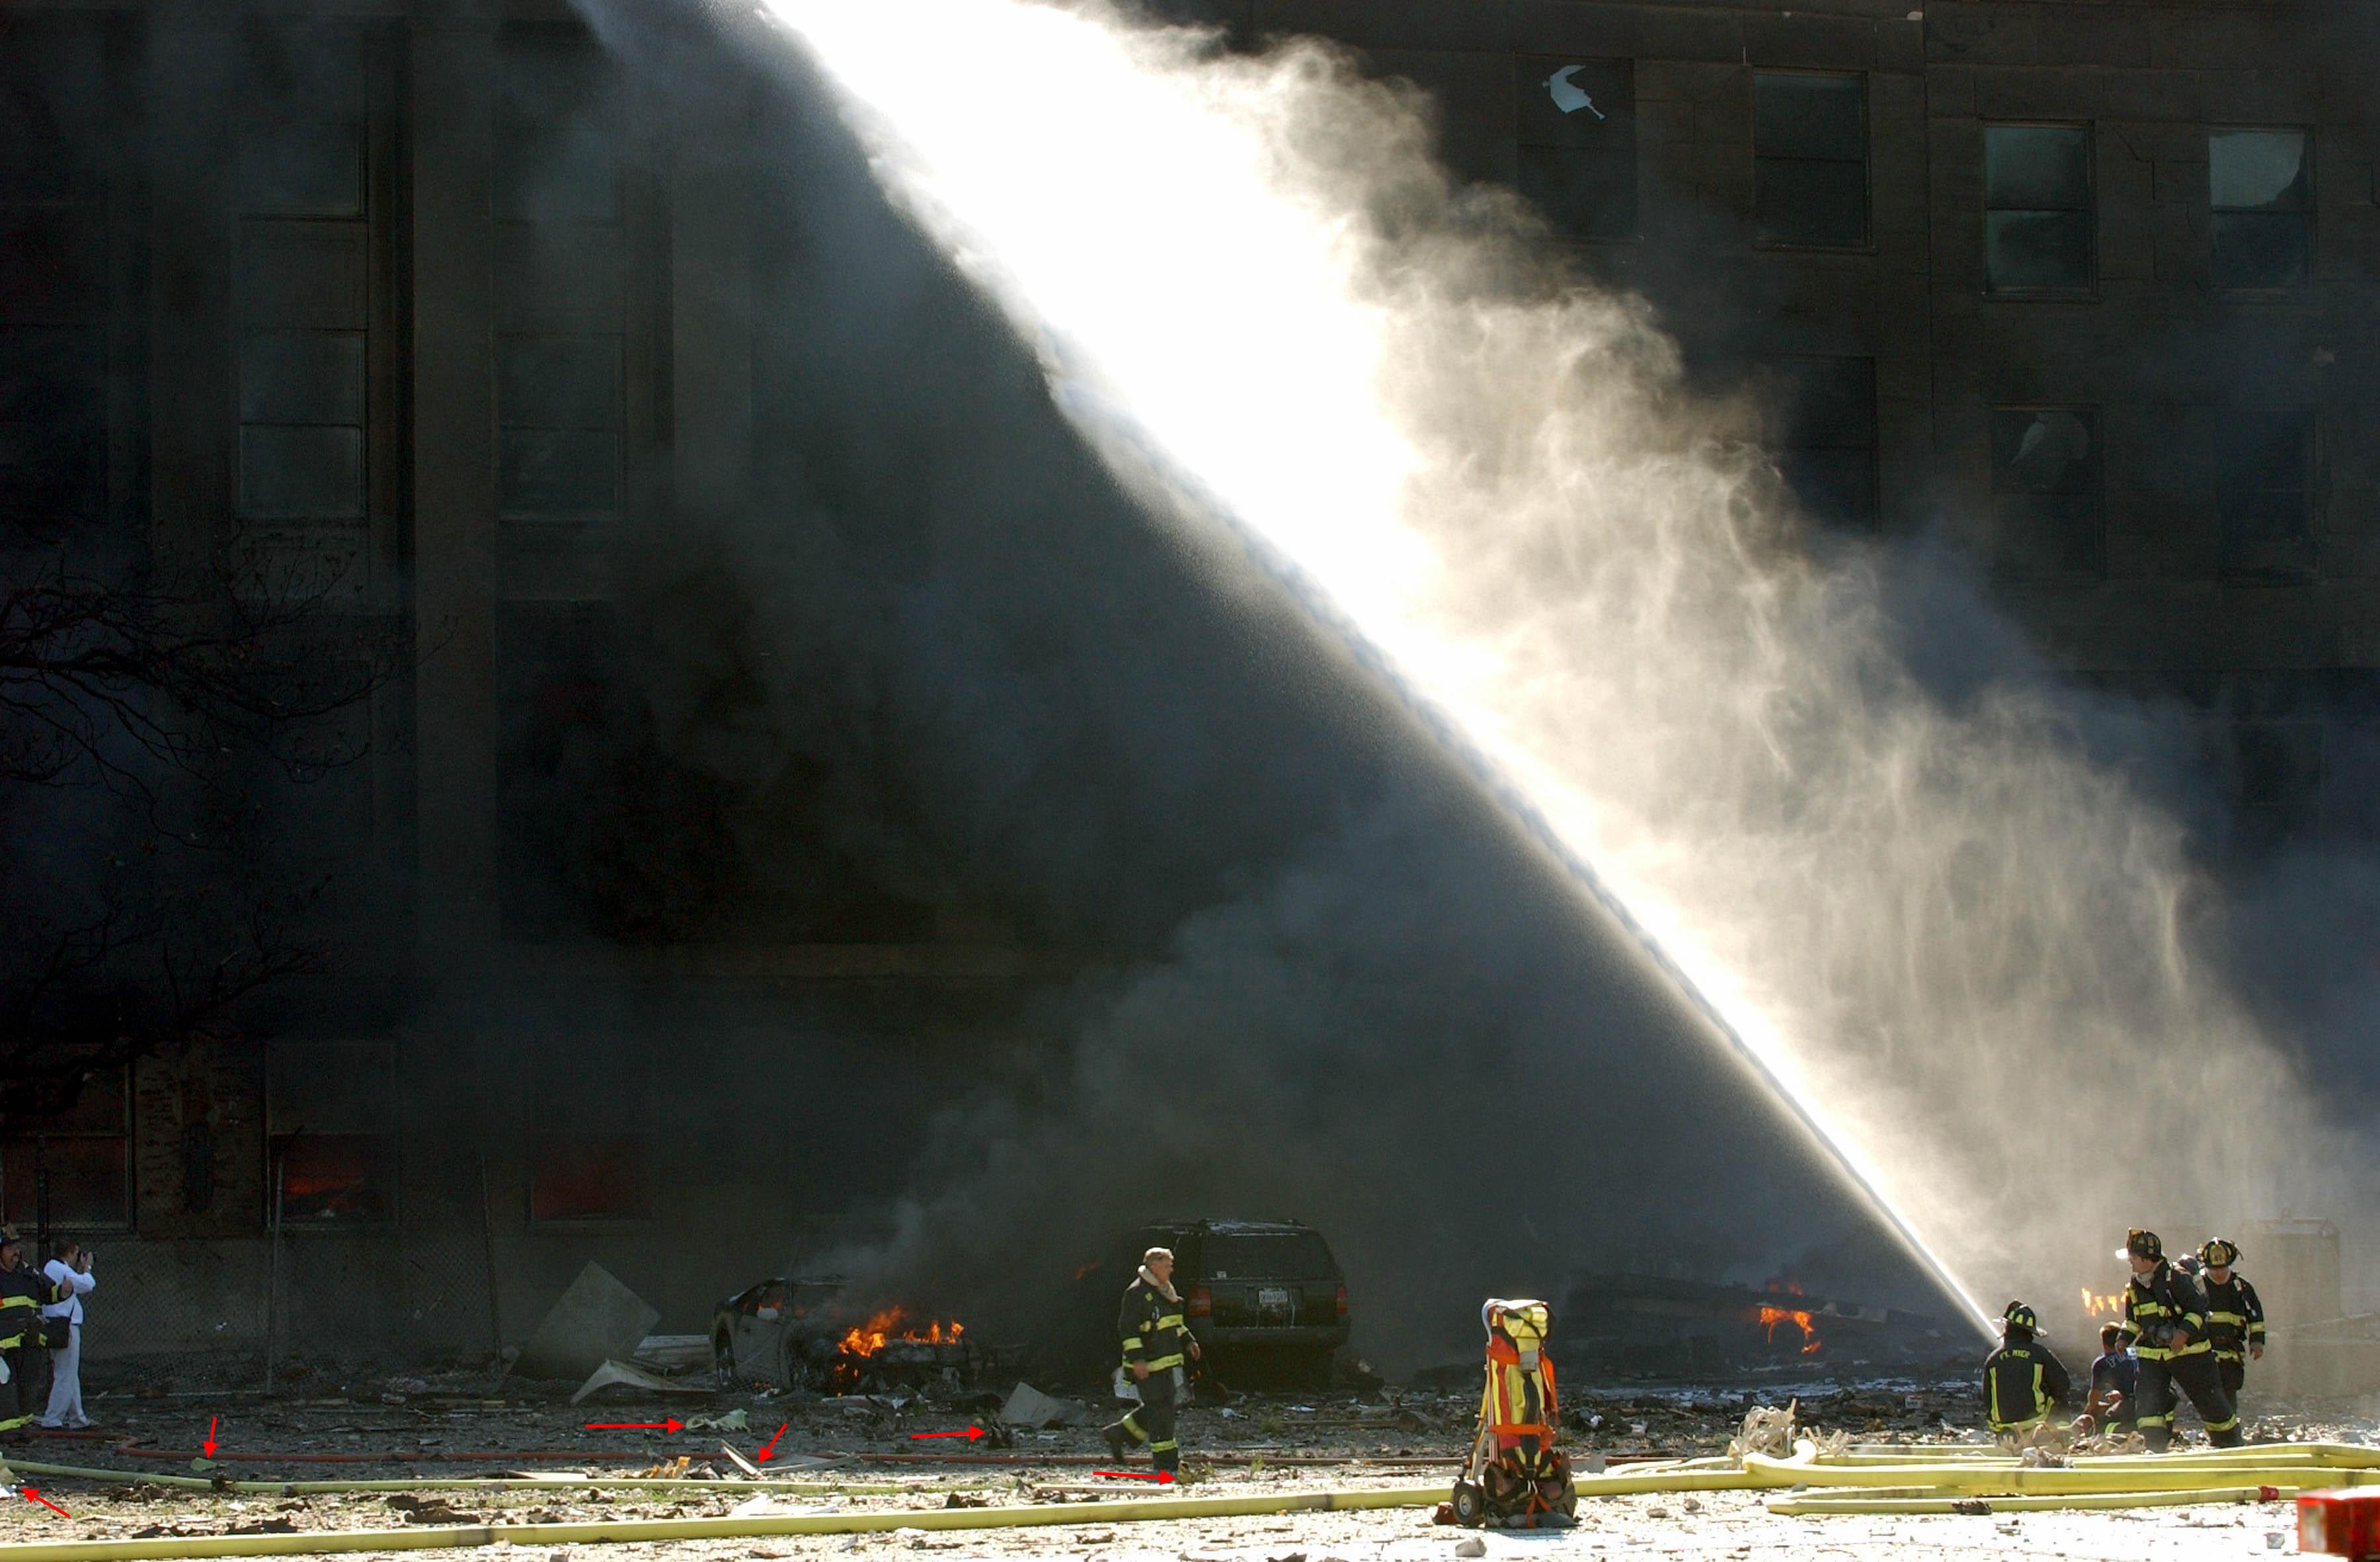 http://fredyz.free.fr/911/debris/morc4.jpg